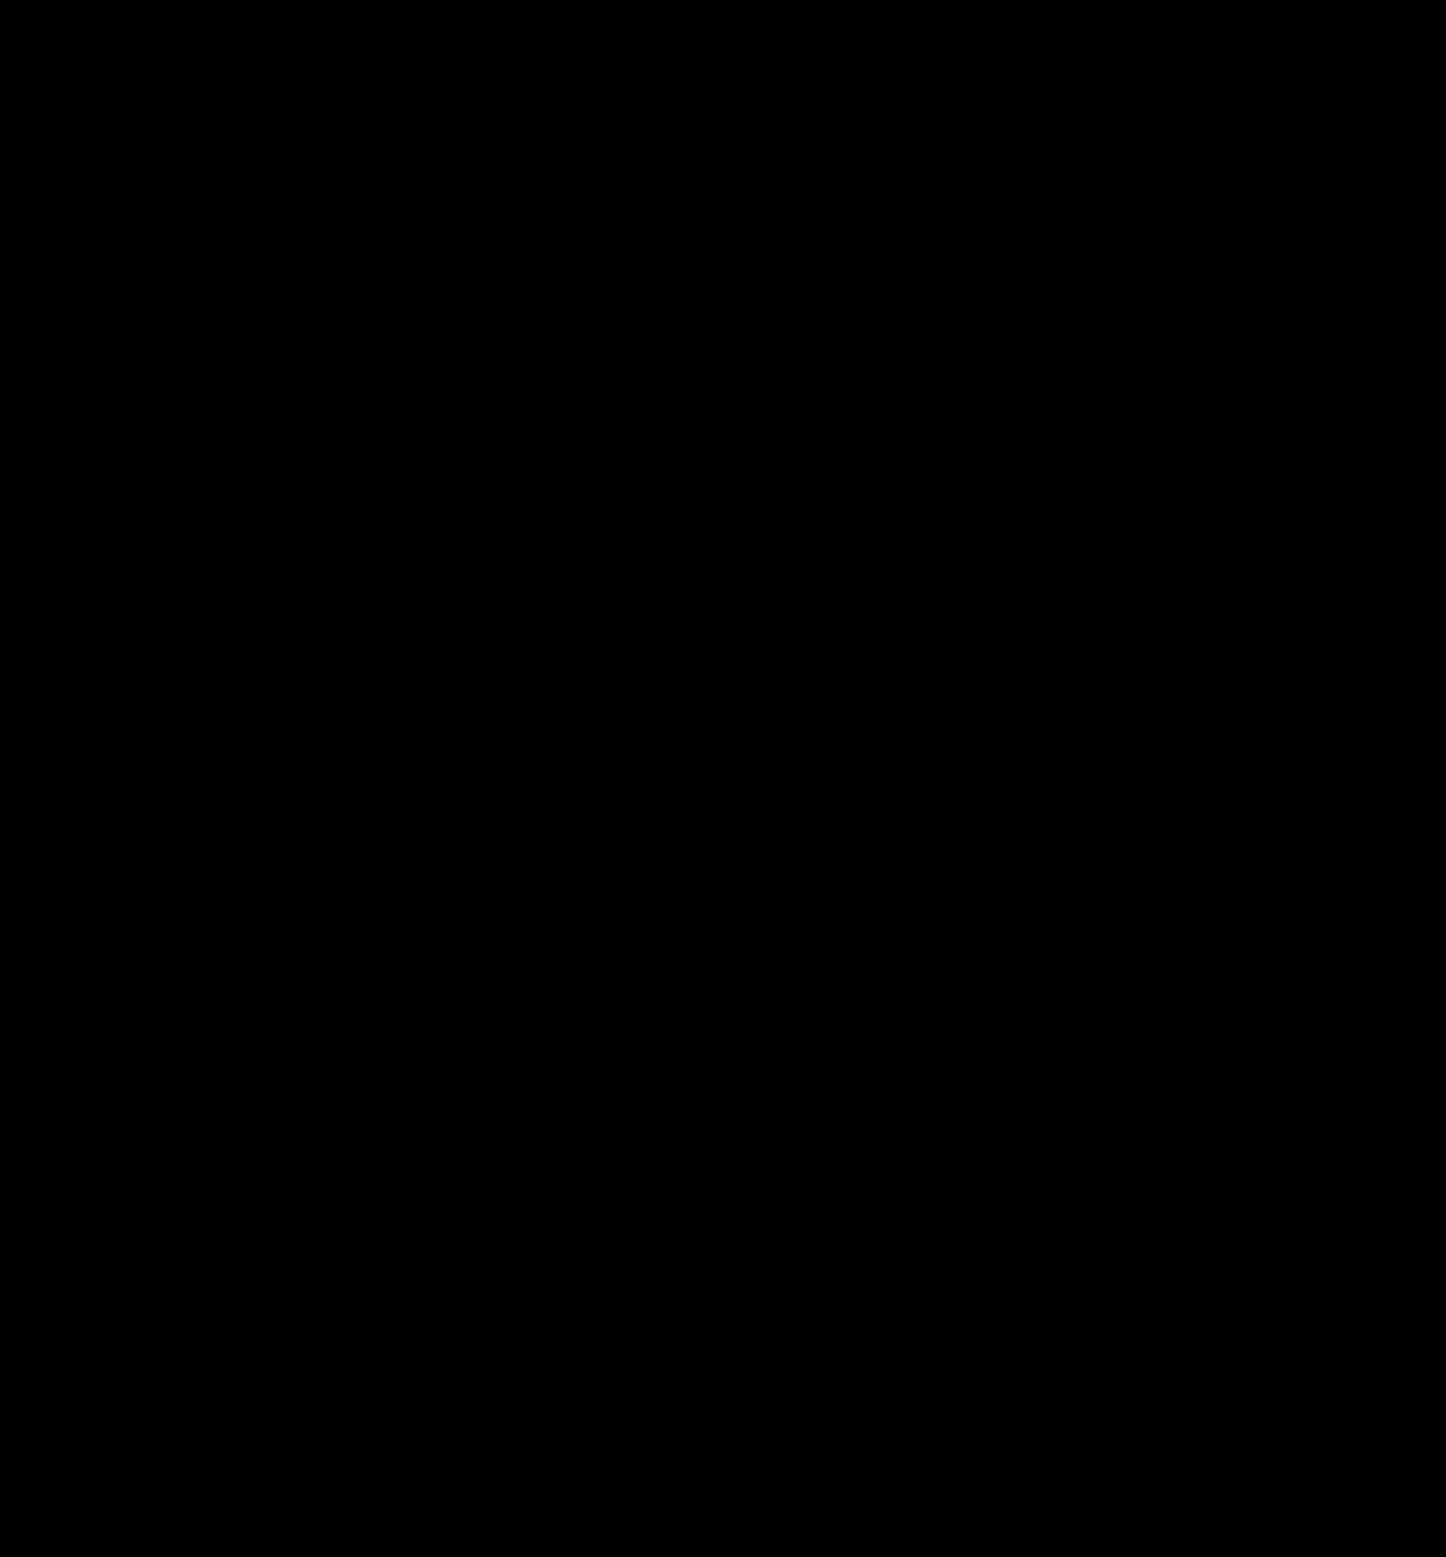 Old Key Silhouette Vectors | FreePatternsArea